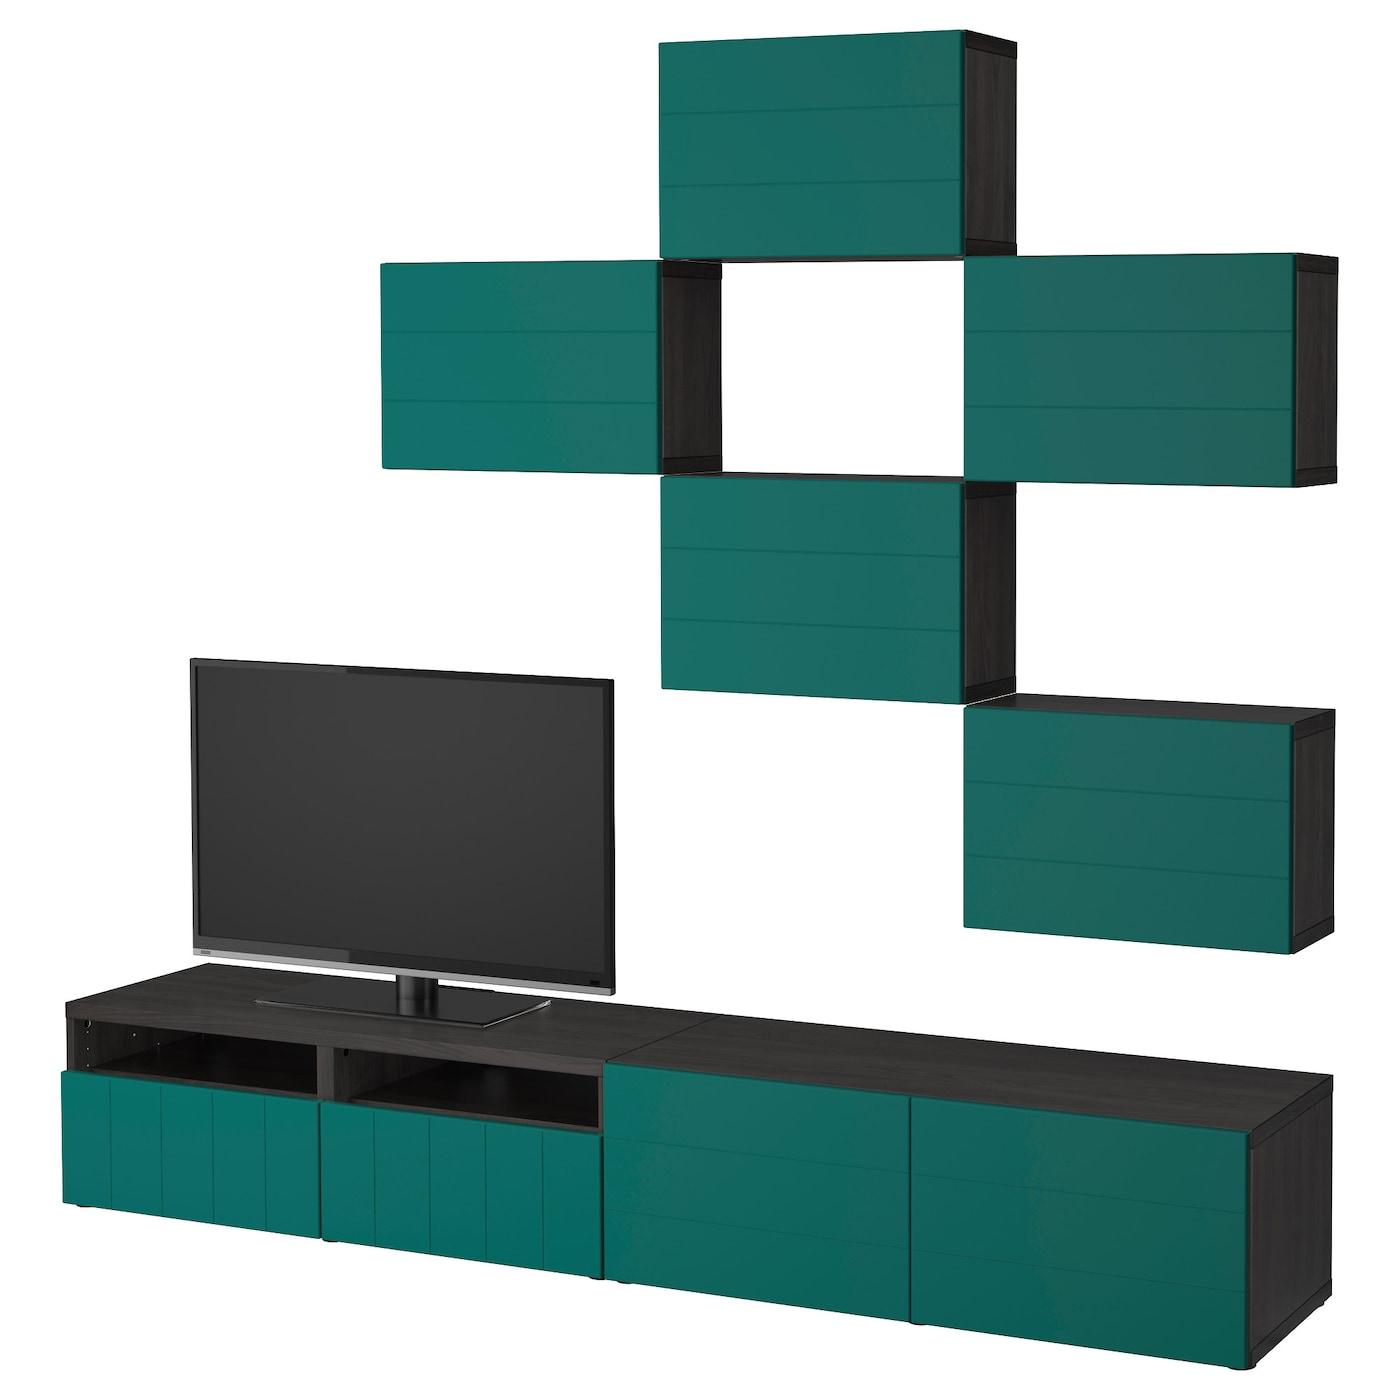 best combinaison meuble tv brun noir hallstavik bleu vert 240x20 40x204 cm ikea. Black Bedroom Furniture Sets. Home Design Ideas